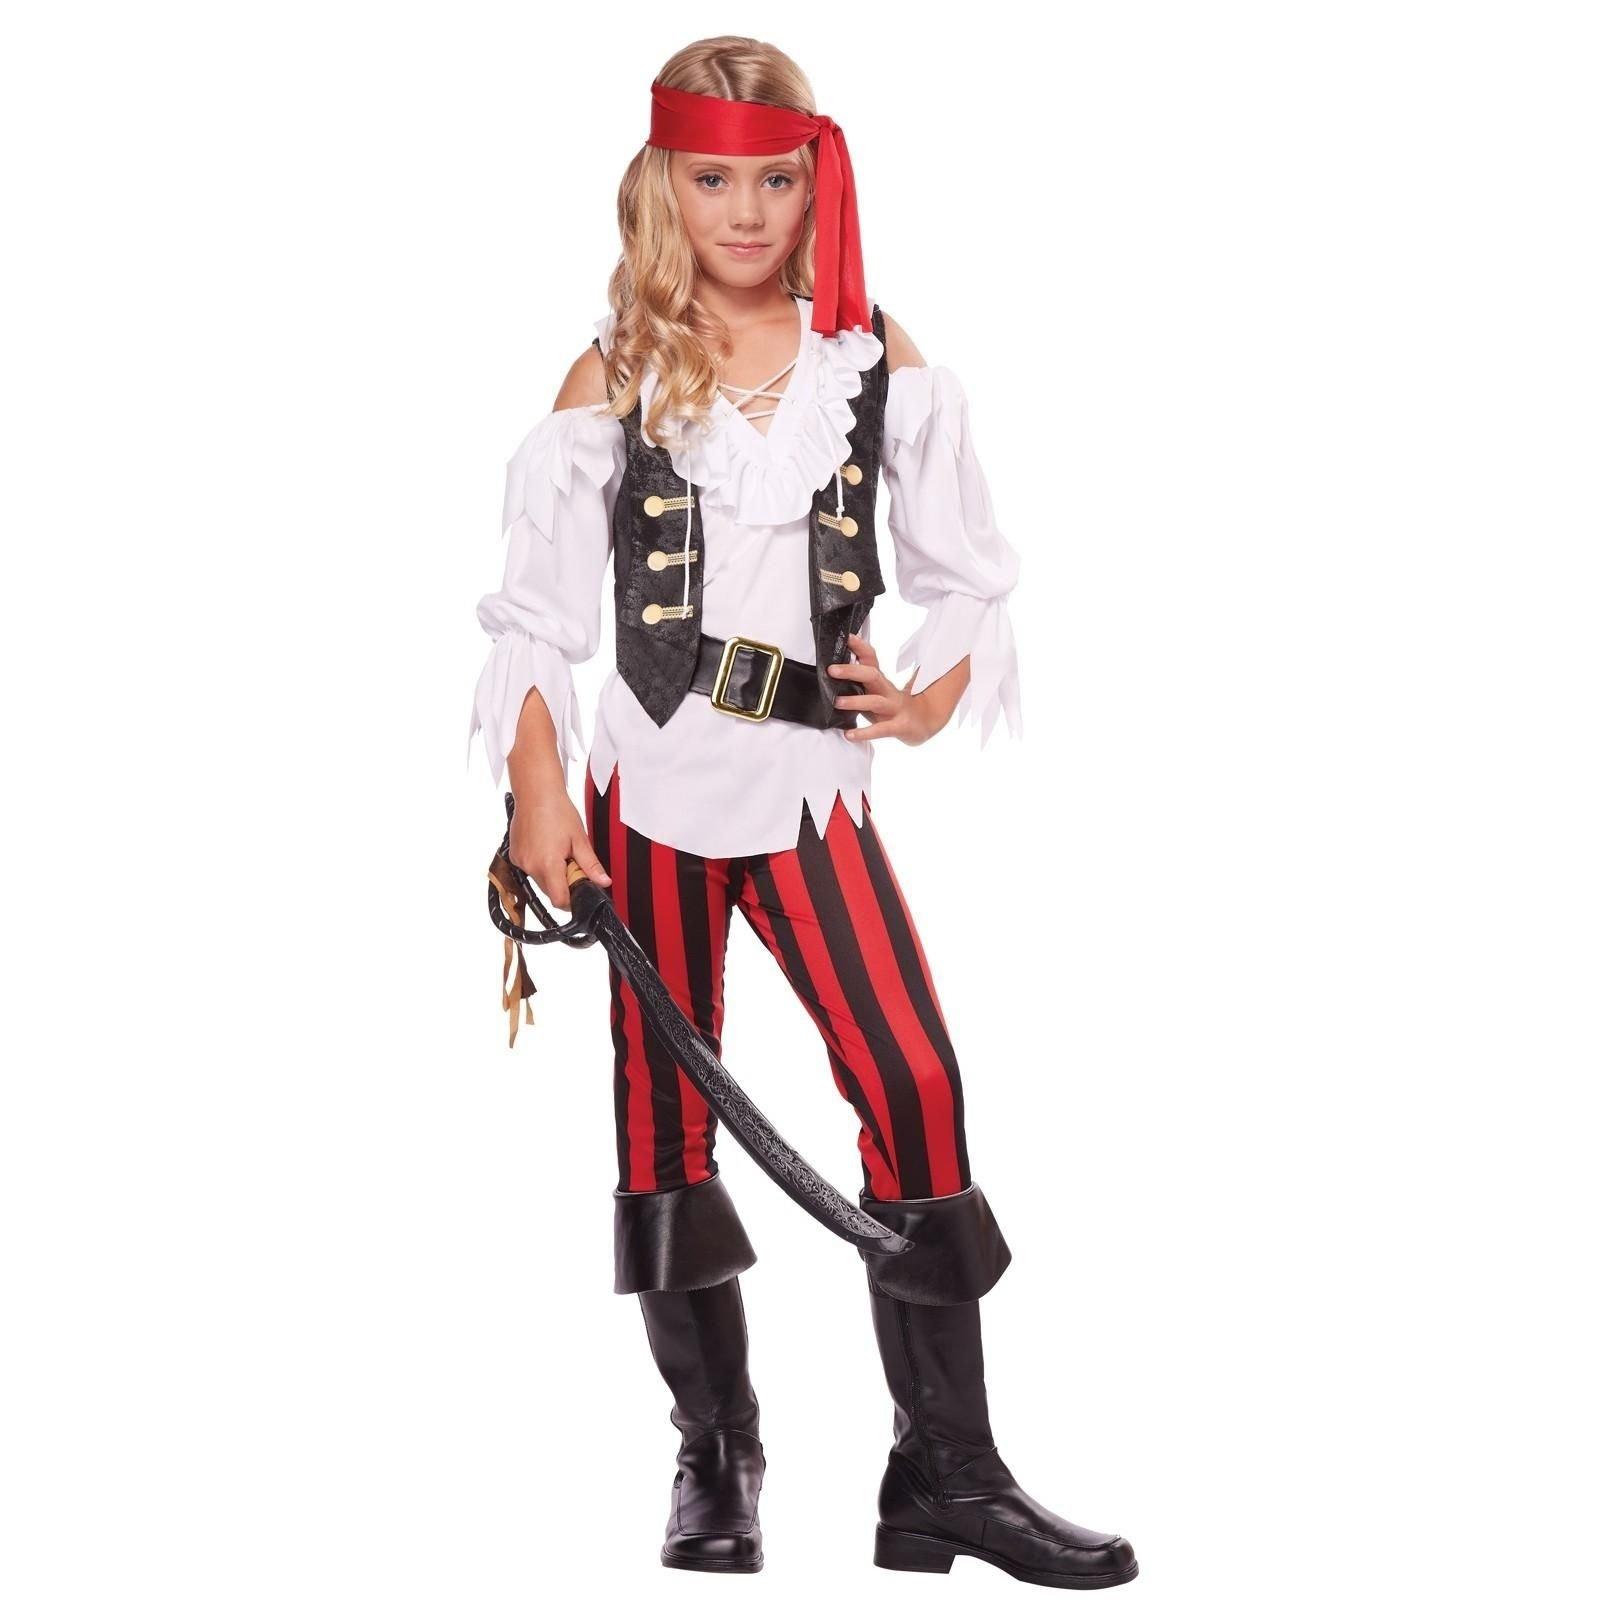 10 Great Pirate Costume Ideas For Kids posh pirate child costume children costumes costumes and 2020